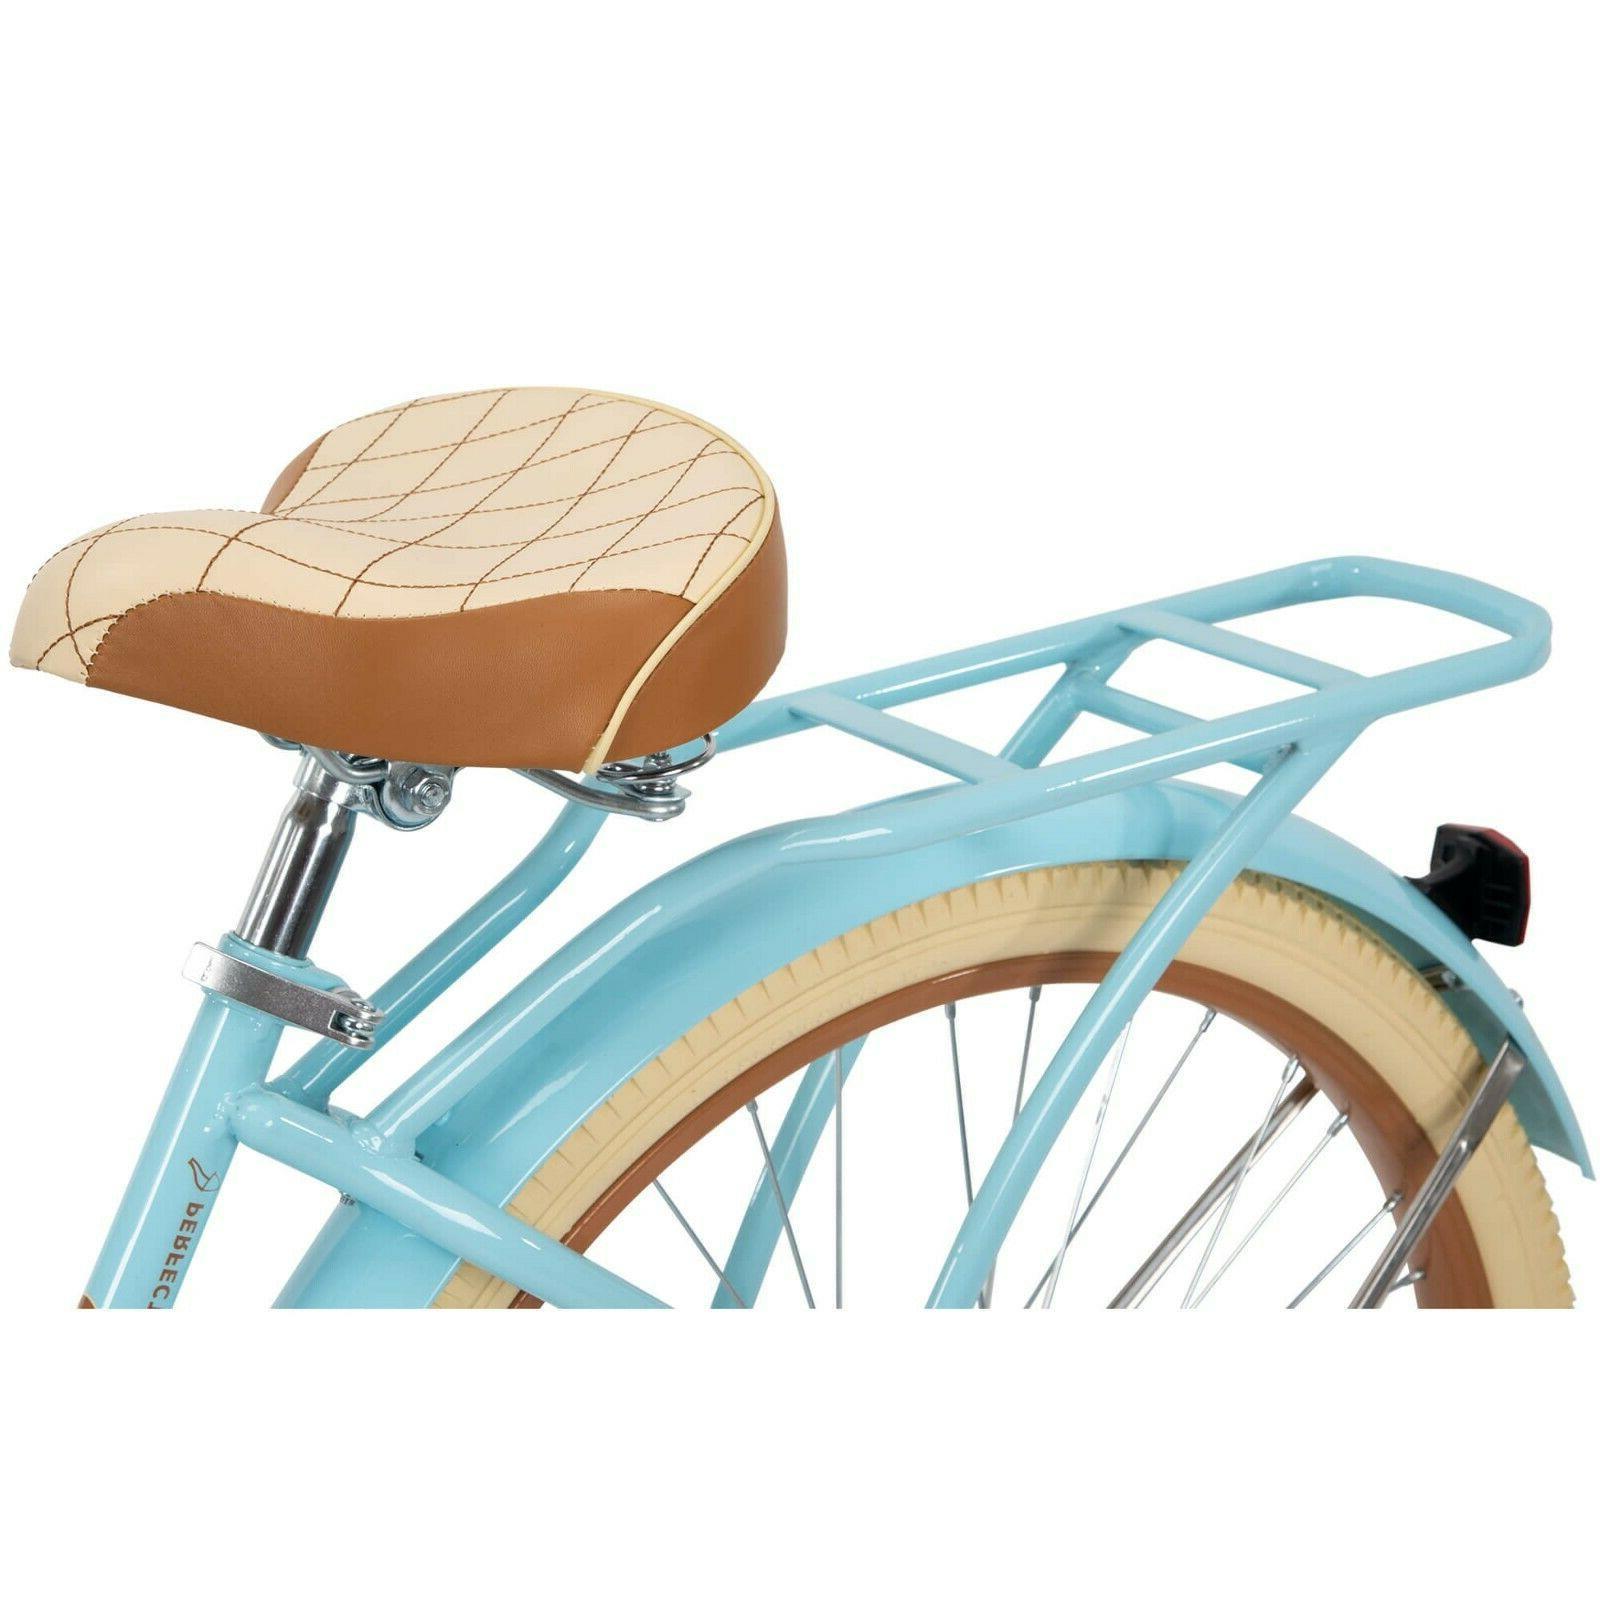 Liv Bicycles For Womens Cruise Cruiser Cruising Beach